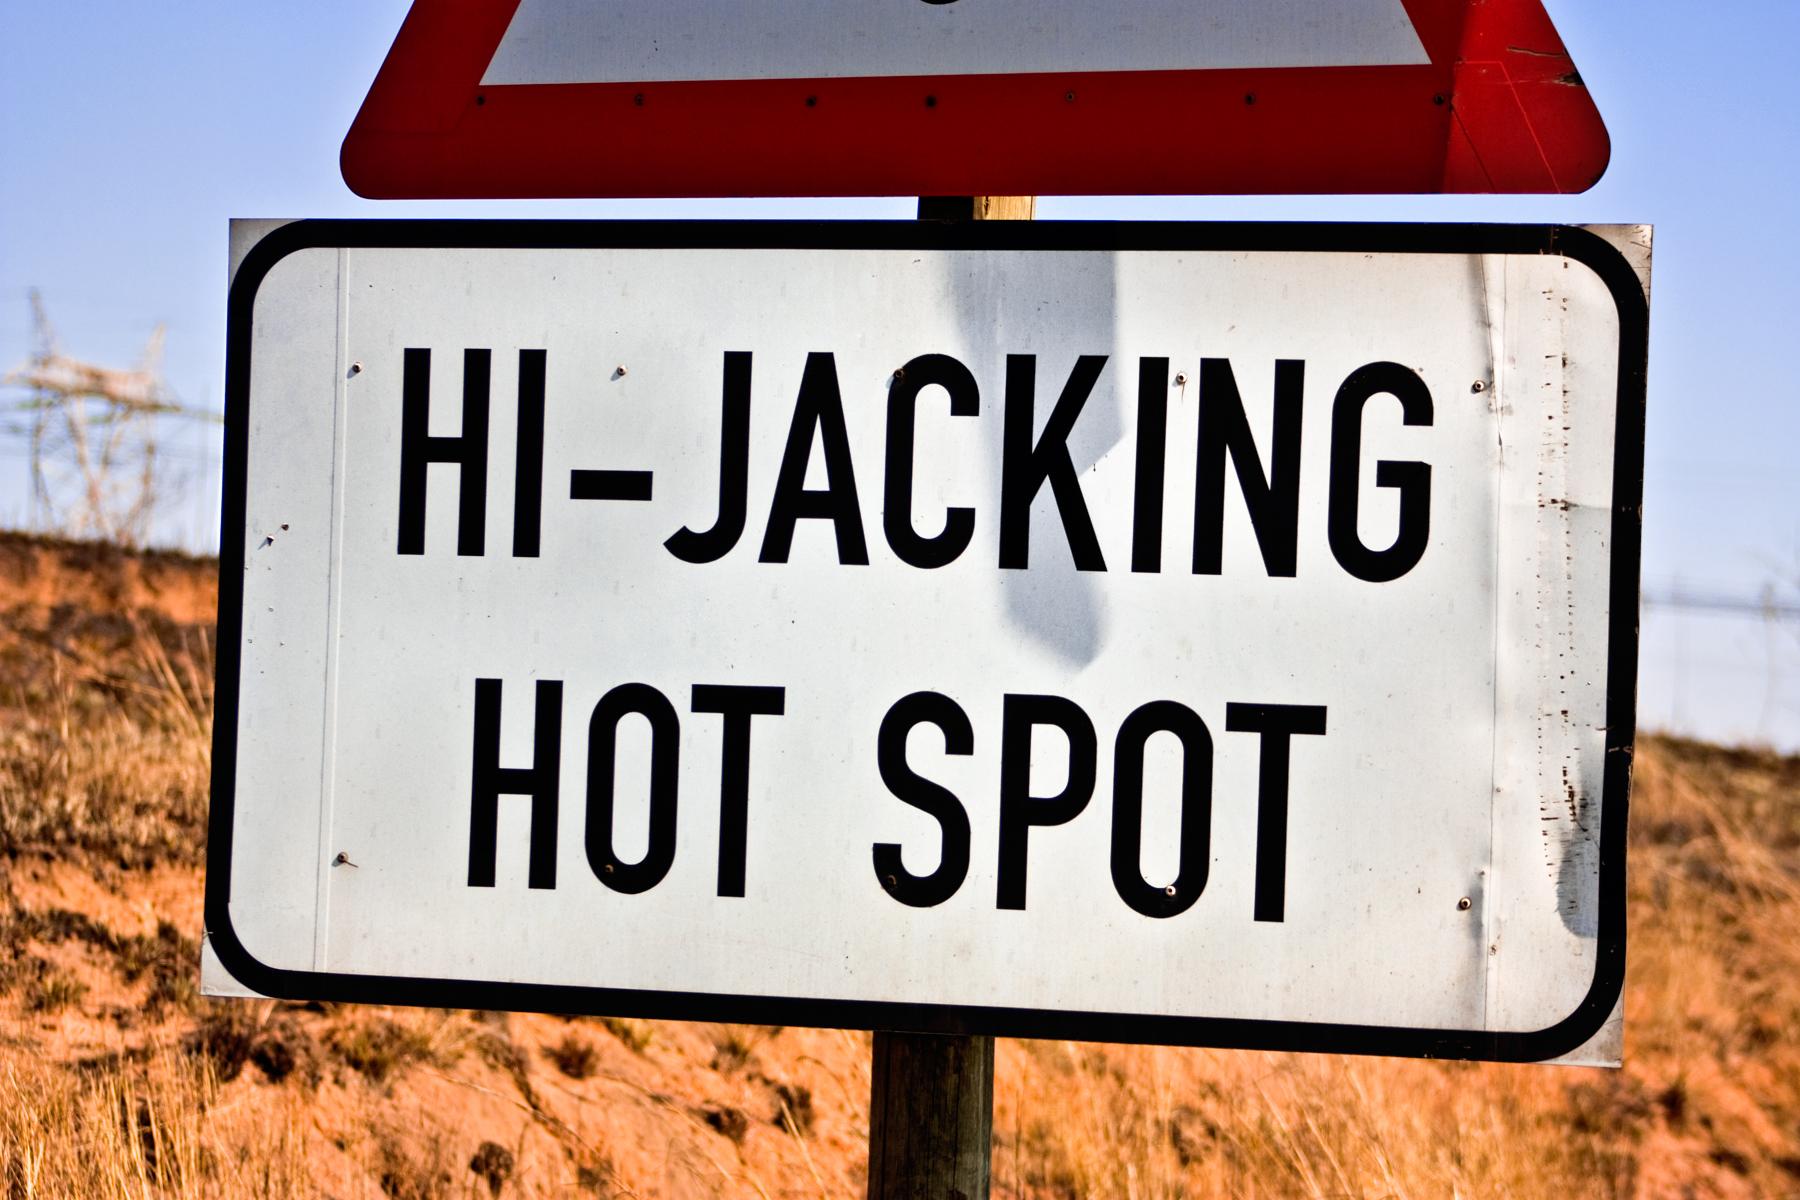 Hi-jacking hotspot sign photo